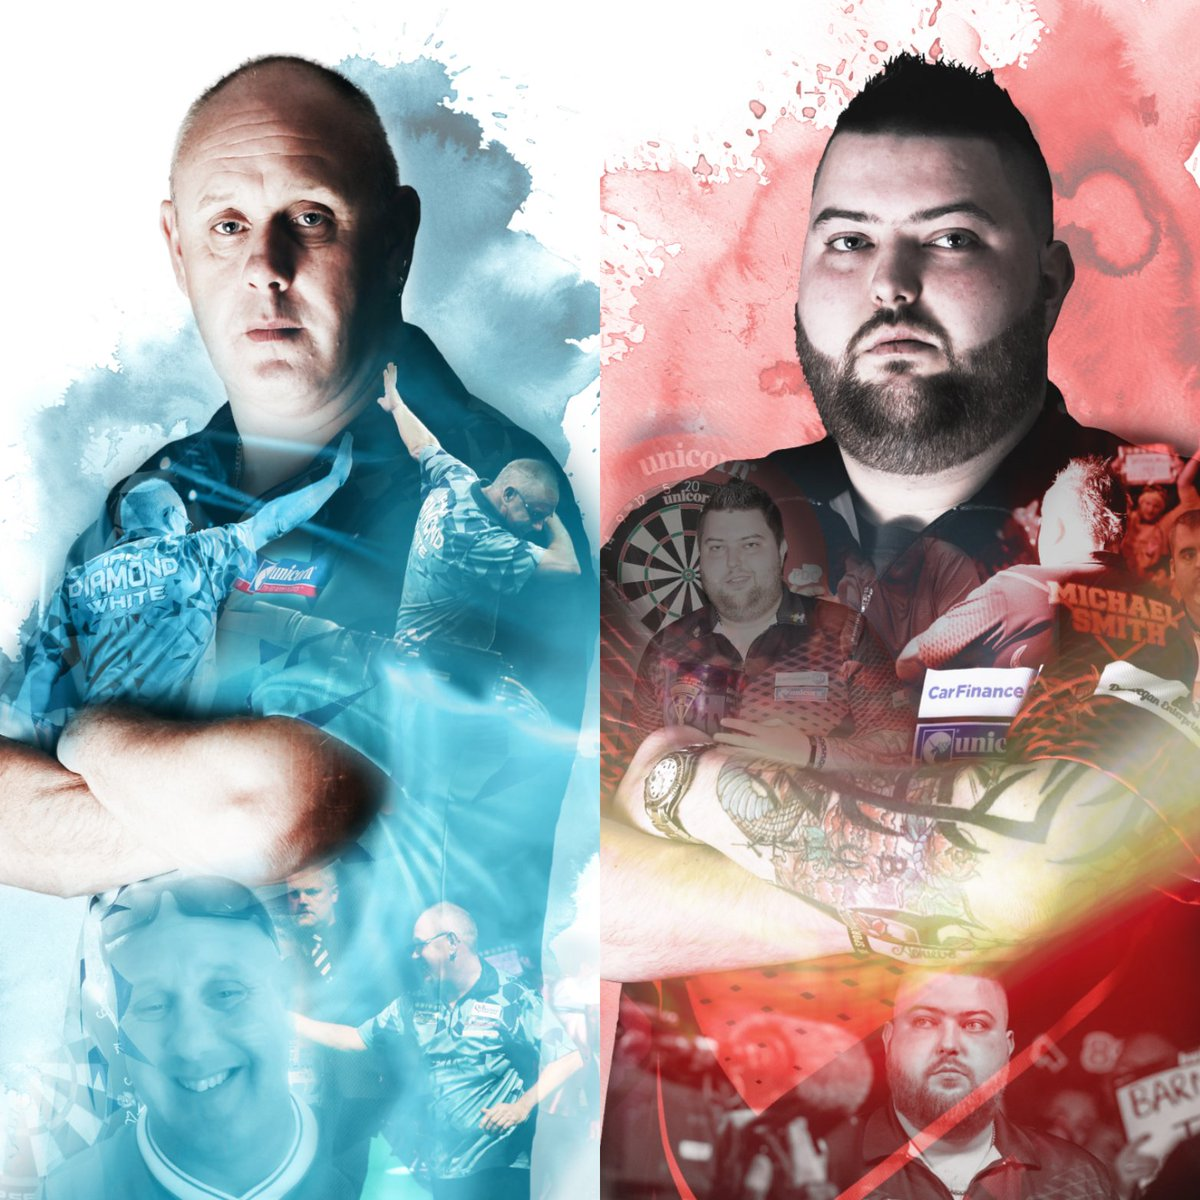 NEWS | @IanDiamondWhite & @BullyBoy180 go close in Wigan! READ ➡ playwiththebest.com/blog/Darts2018…